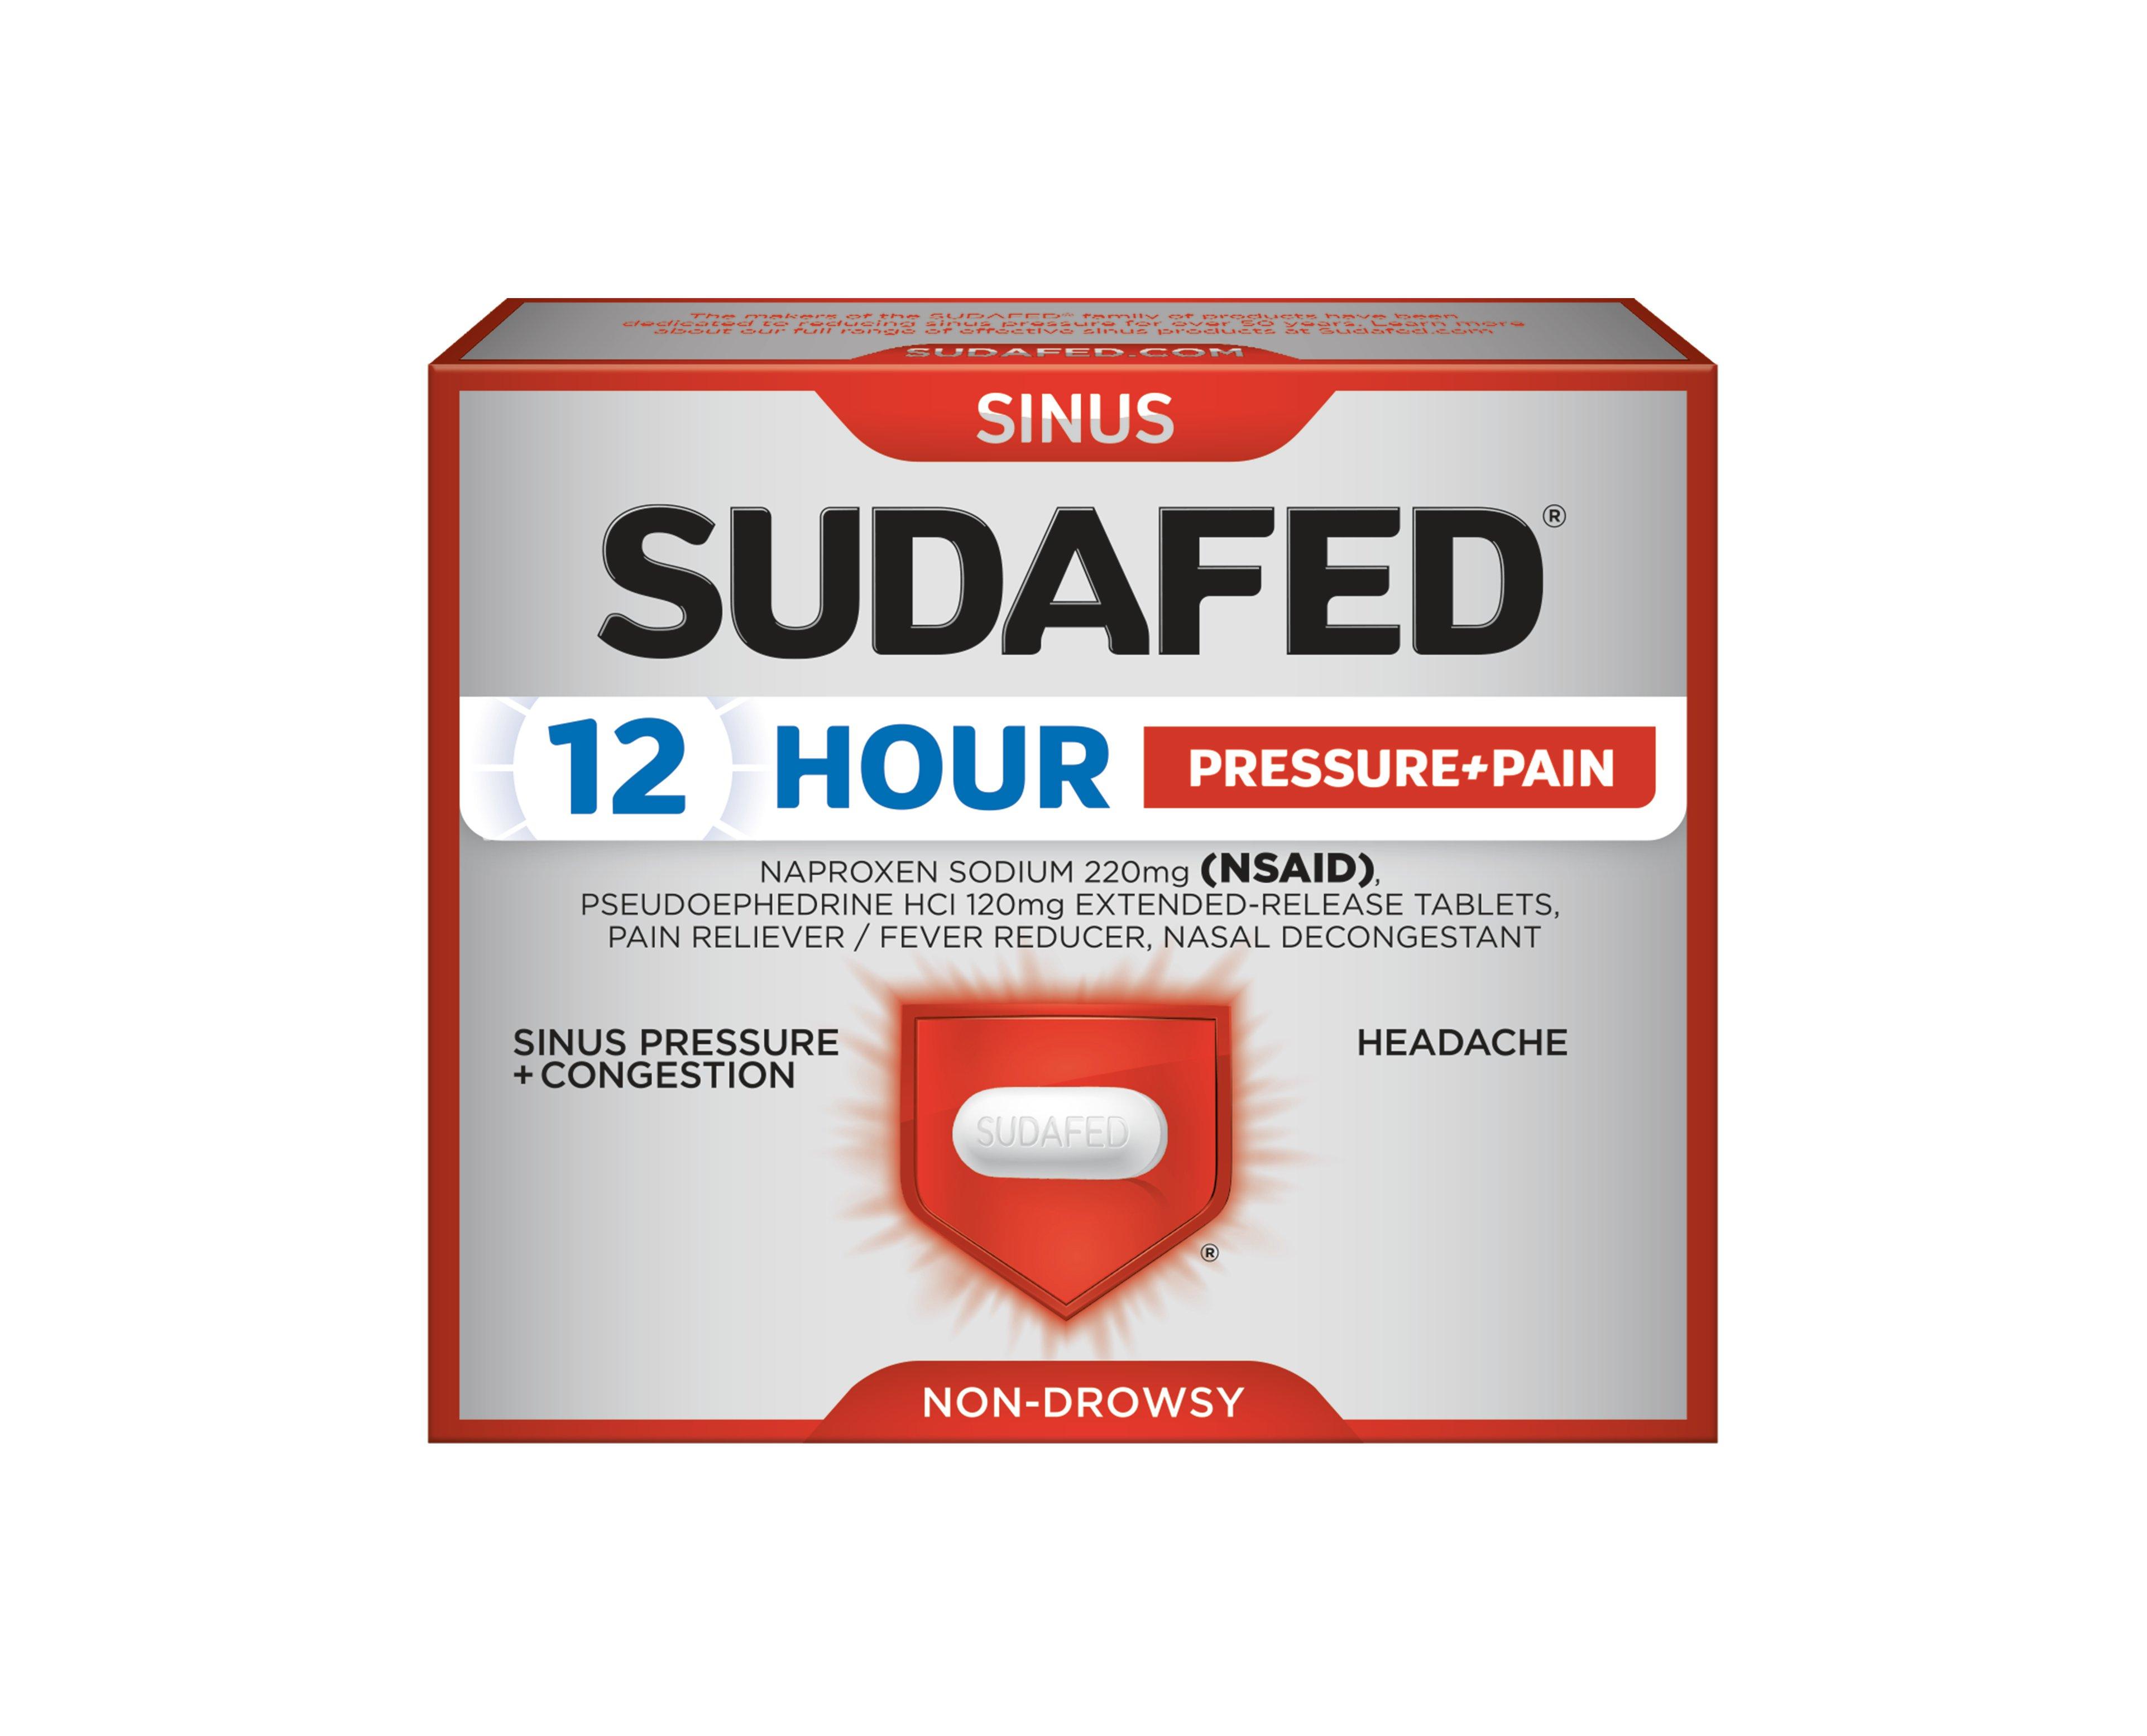 SUDAFED® 12 HOUR PRESSURE+PAIN